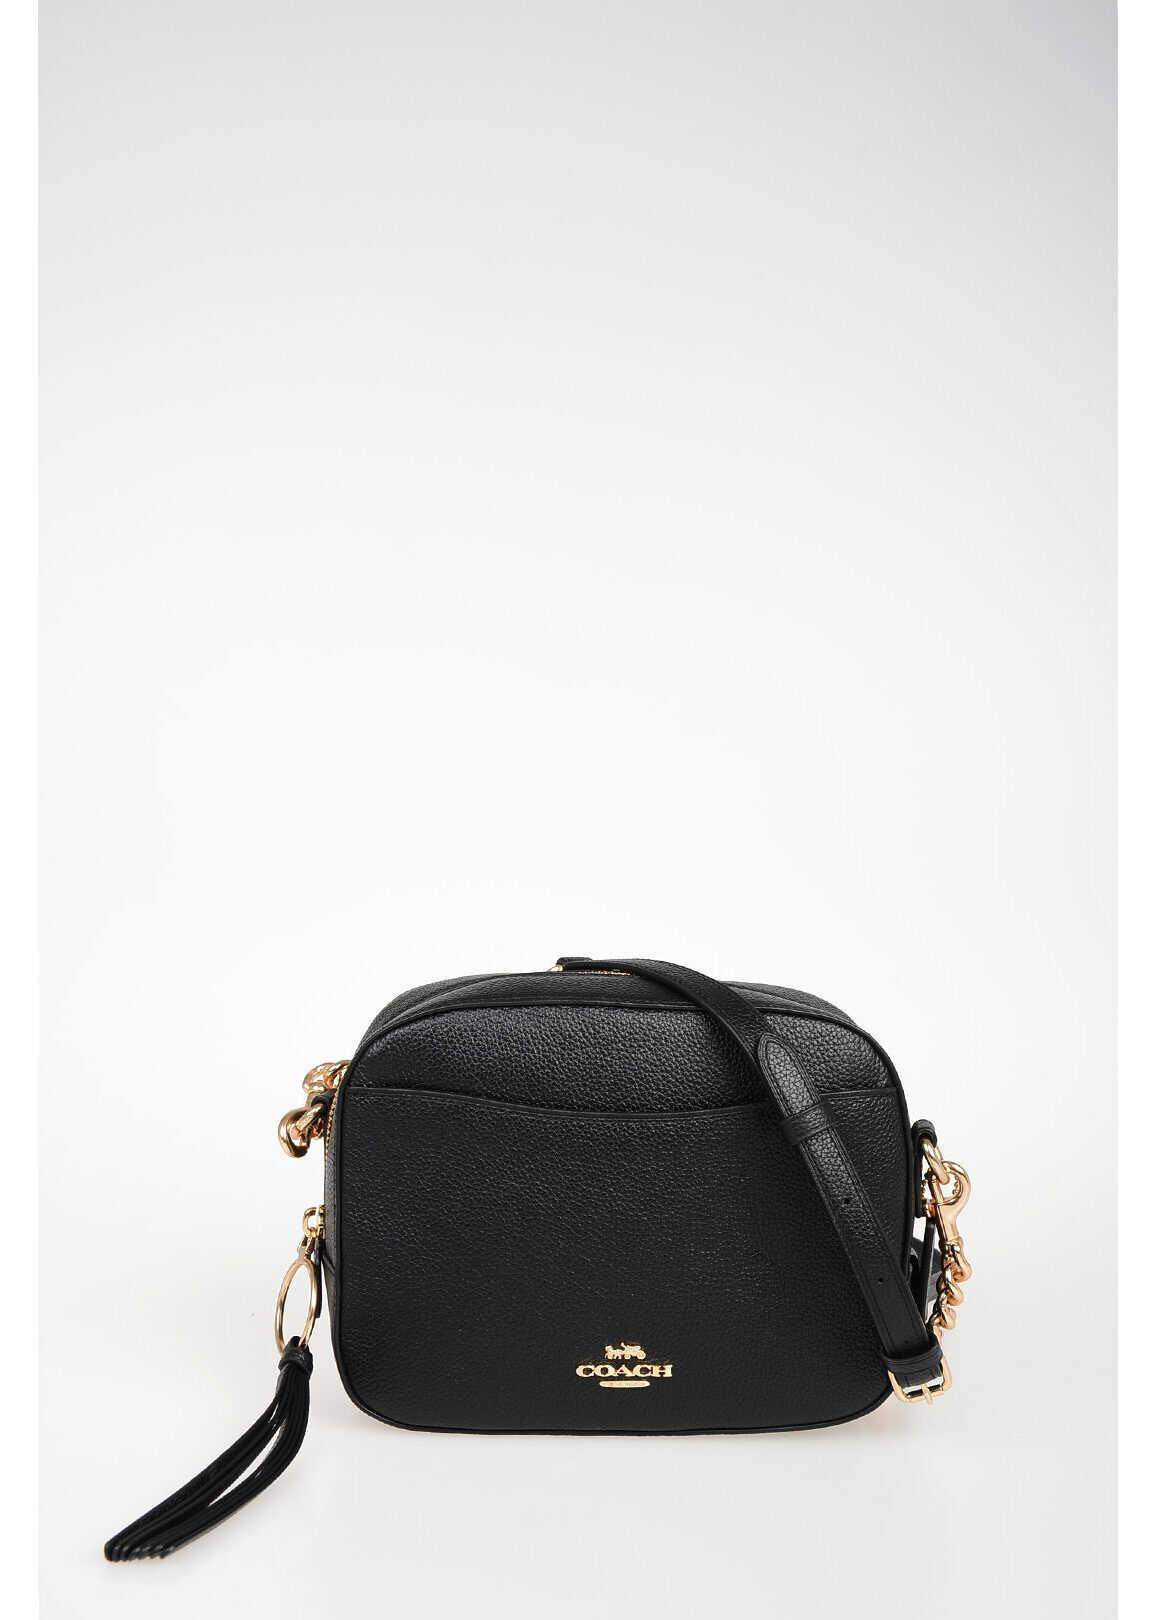 COACH Leather Camera Bag BLACK